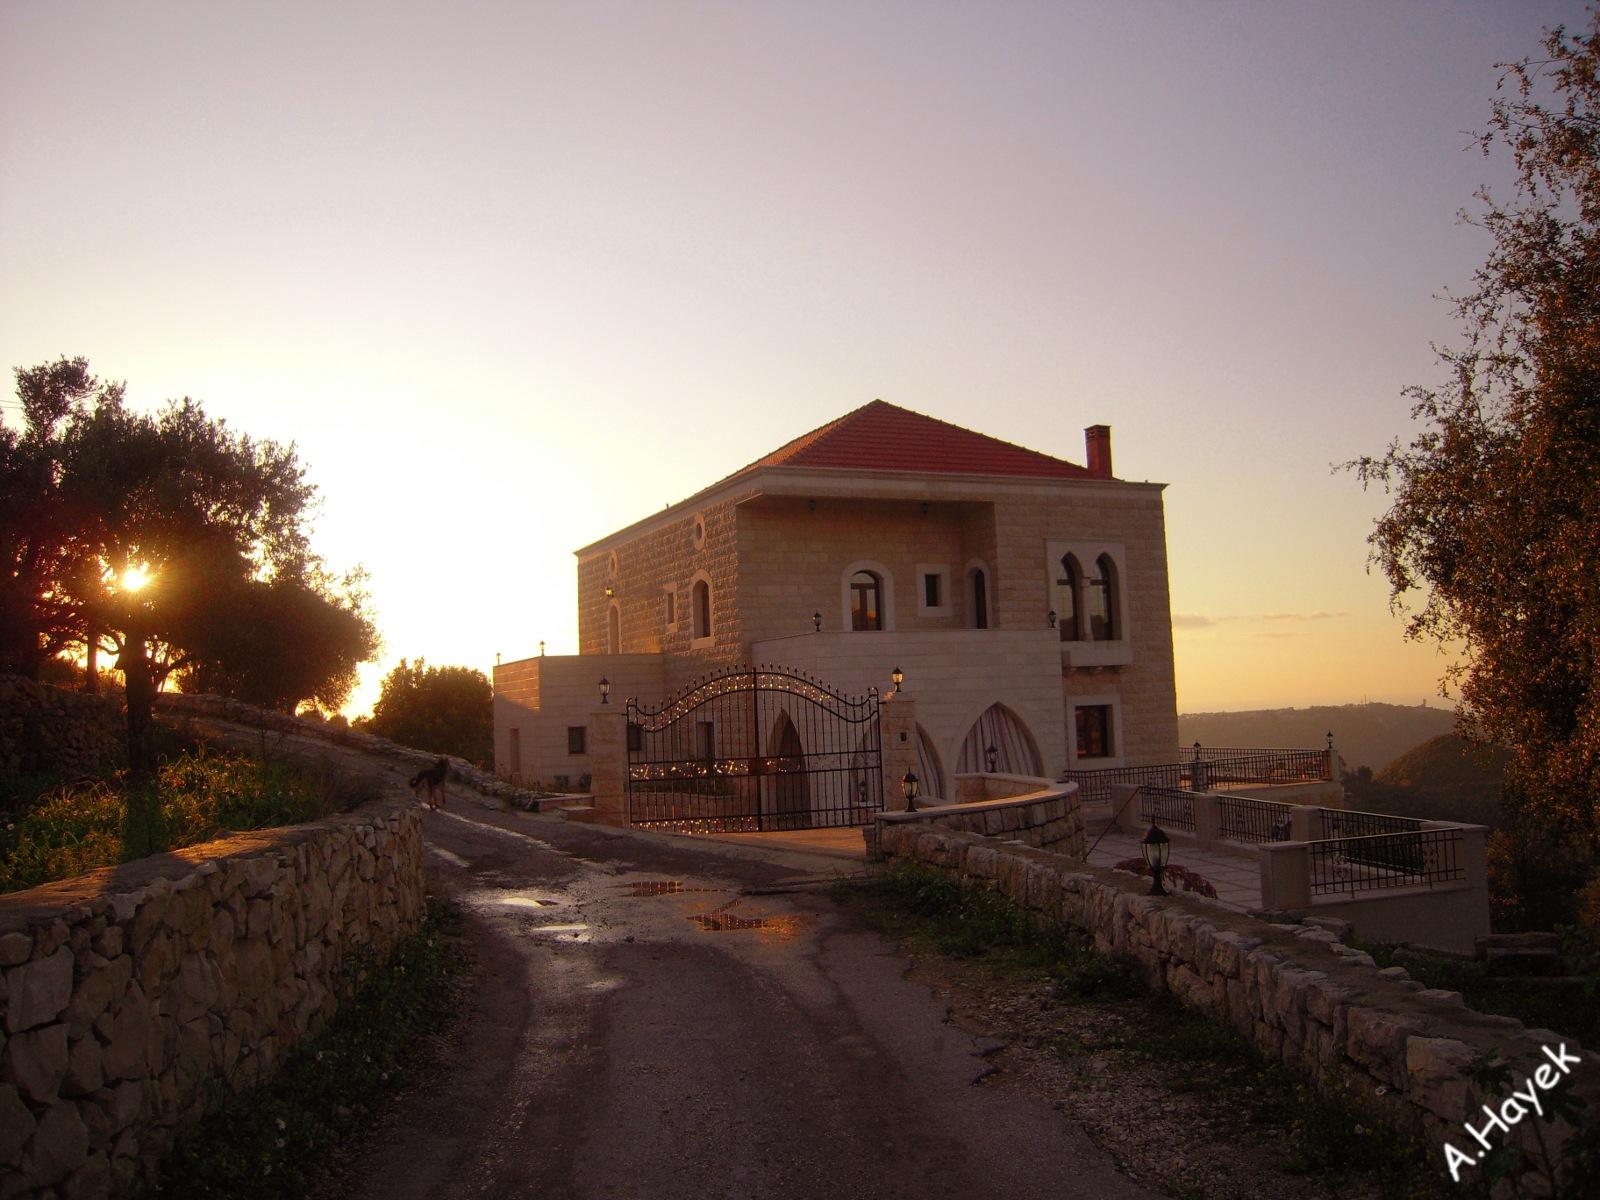 Pin maison traditionnelle libanaise baabdath liban flickr for Architecture maison traditionnelle libanaise